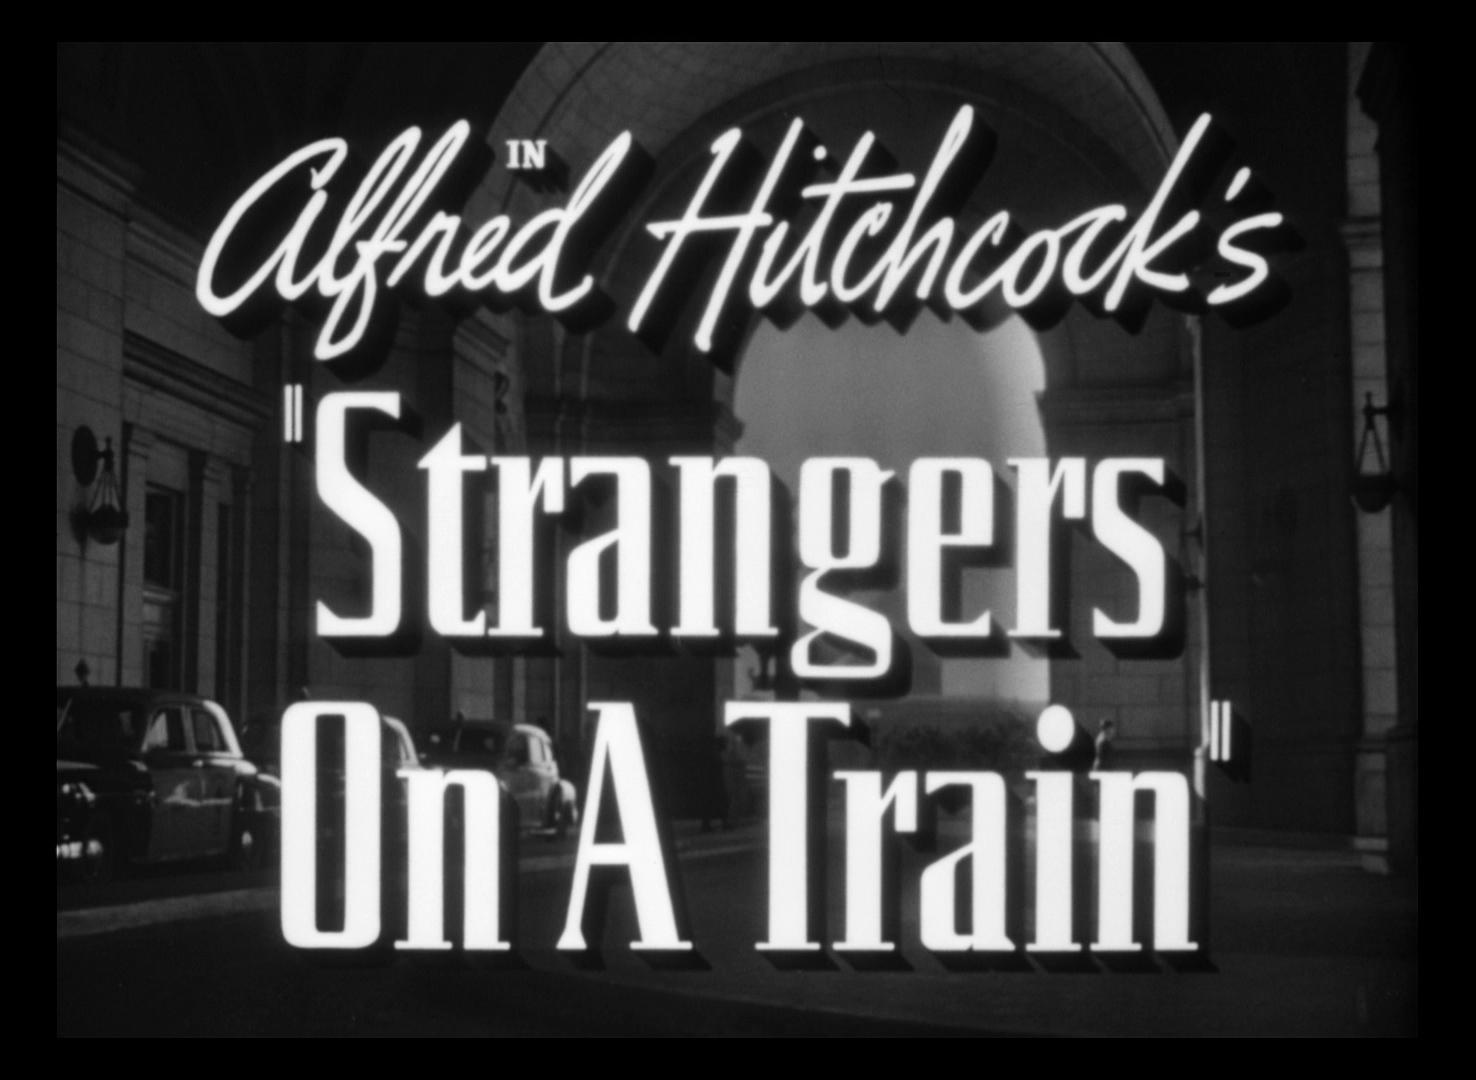 Essays on strangers on a train